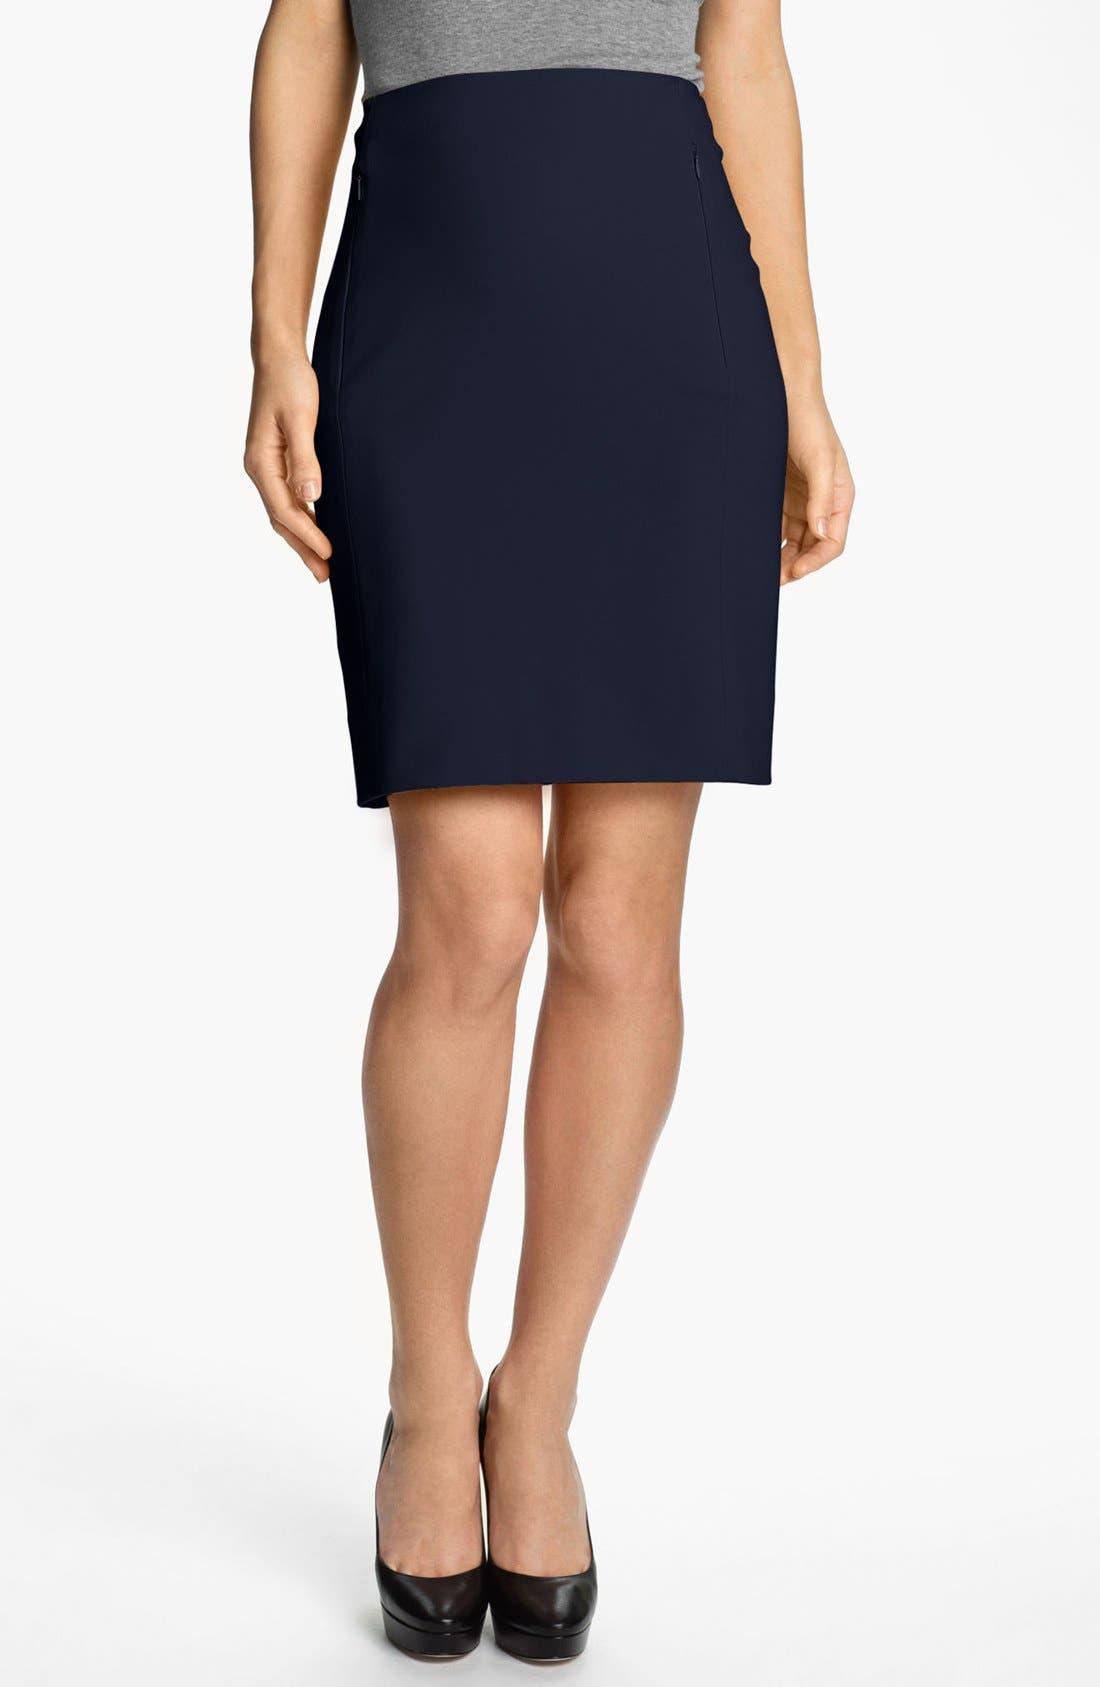 Alternate Image 1 Selected - Diane von Furstenberg 'New Koto' Pencil Skirt